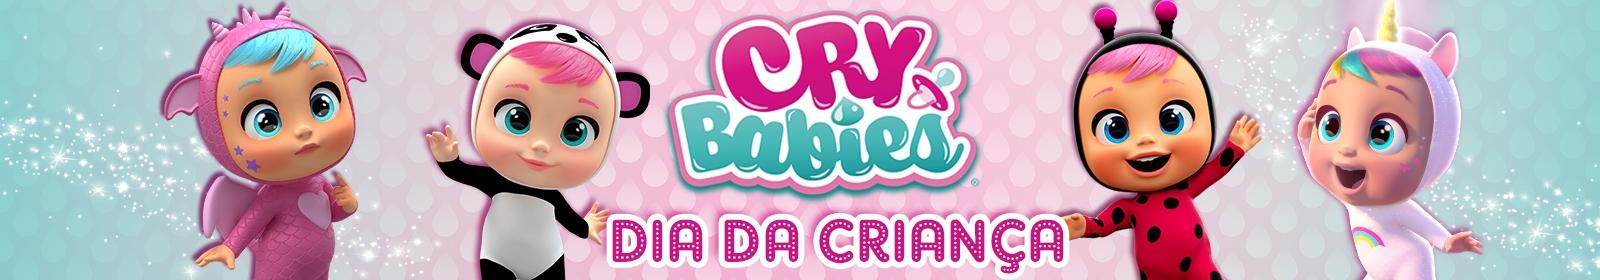 comprar bonecas cry babies